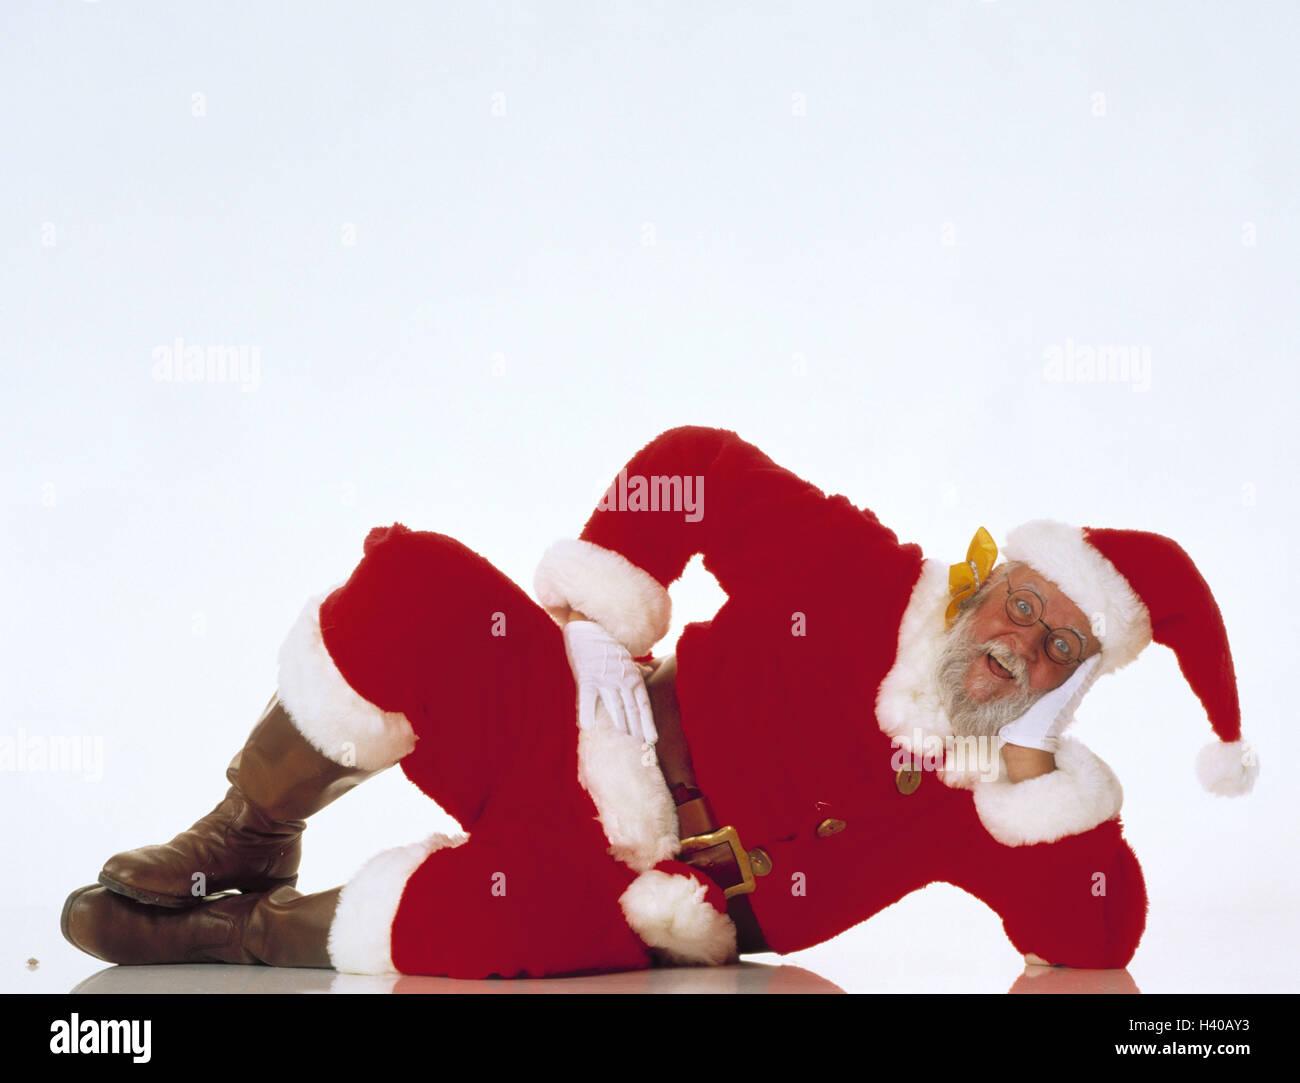 Santa Claus, lie, head, X-mas, Christmas, Santa, recreation, rest rest on, take it easy, inside, studio, cut out, - Stock Image